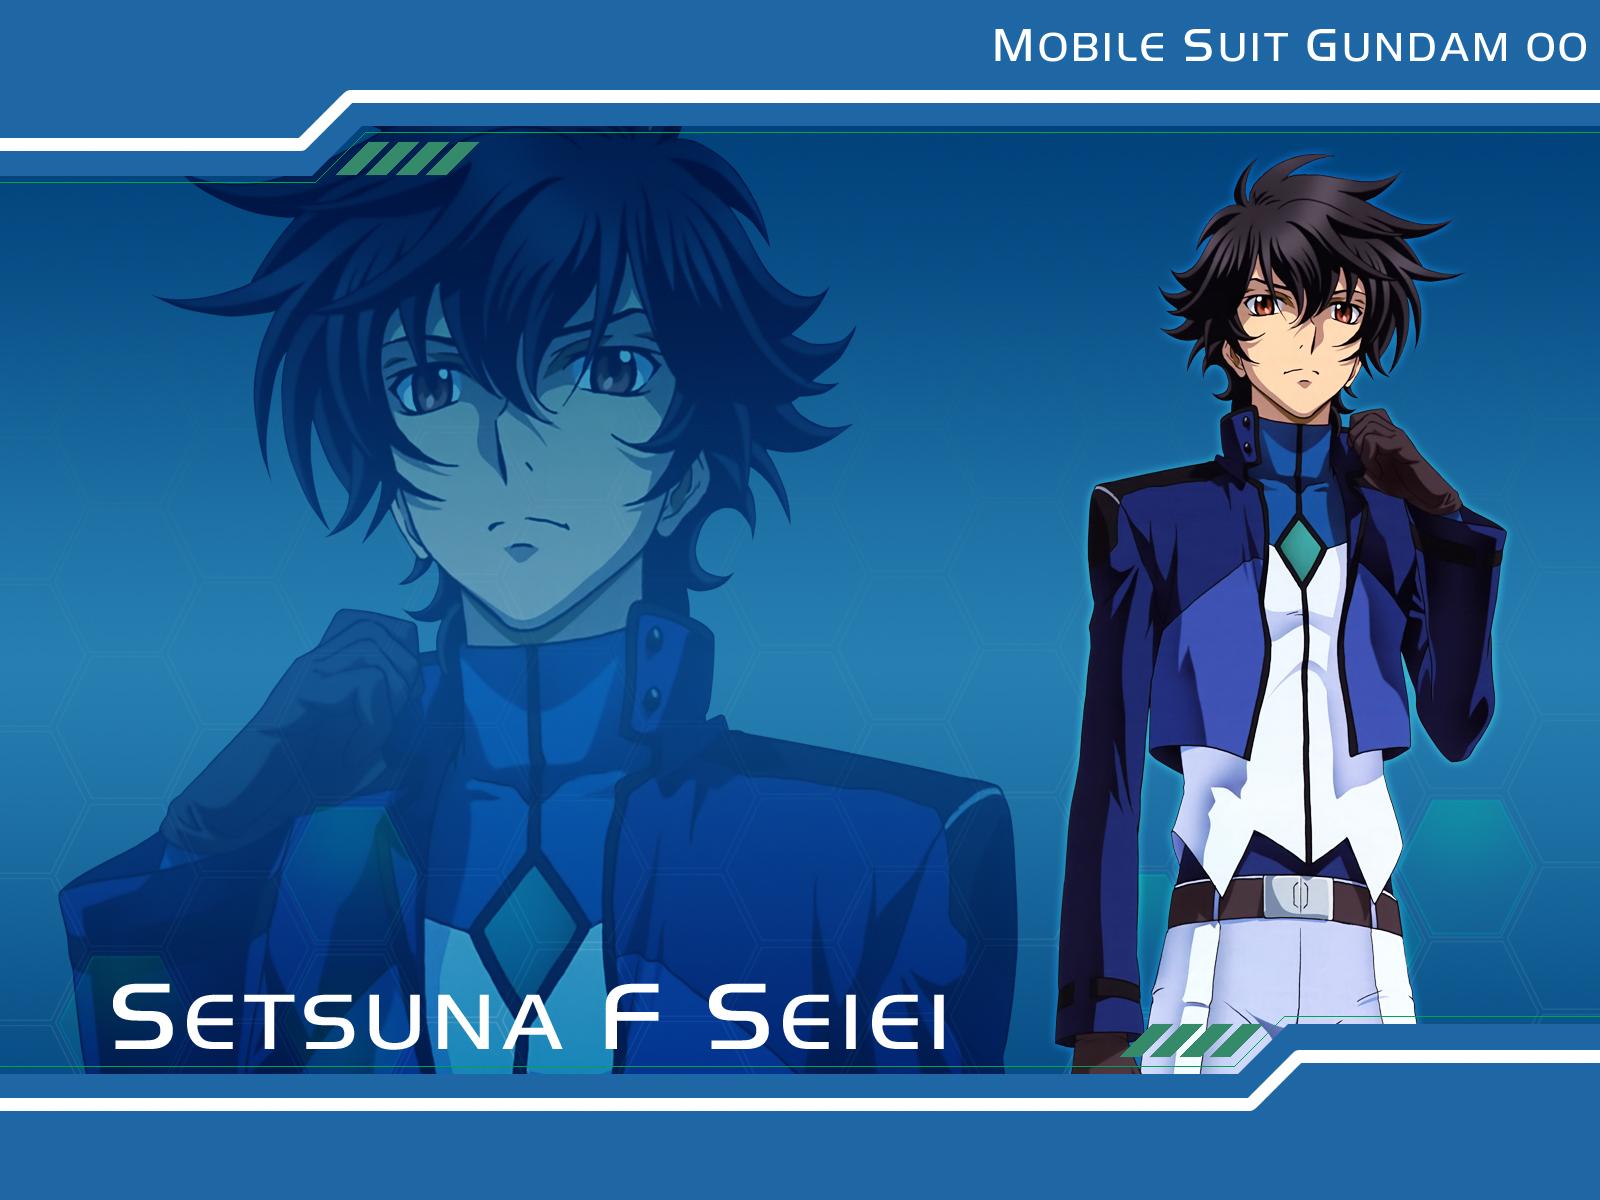 Setsuna F Seiei Mobile Suit Gundam 00 Wallpaper 184021 Zerochan Anime Image Board